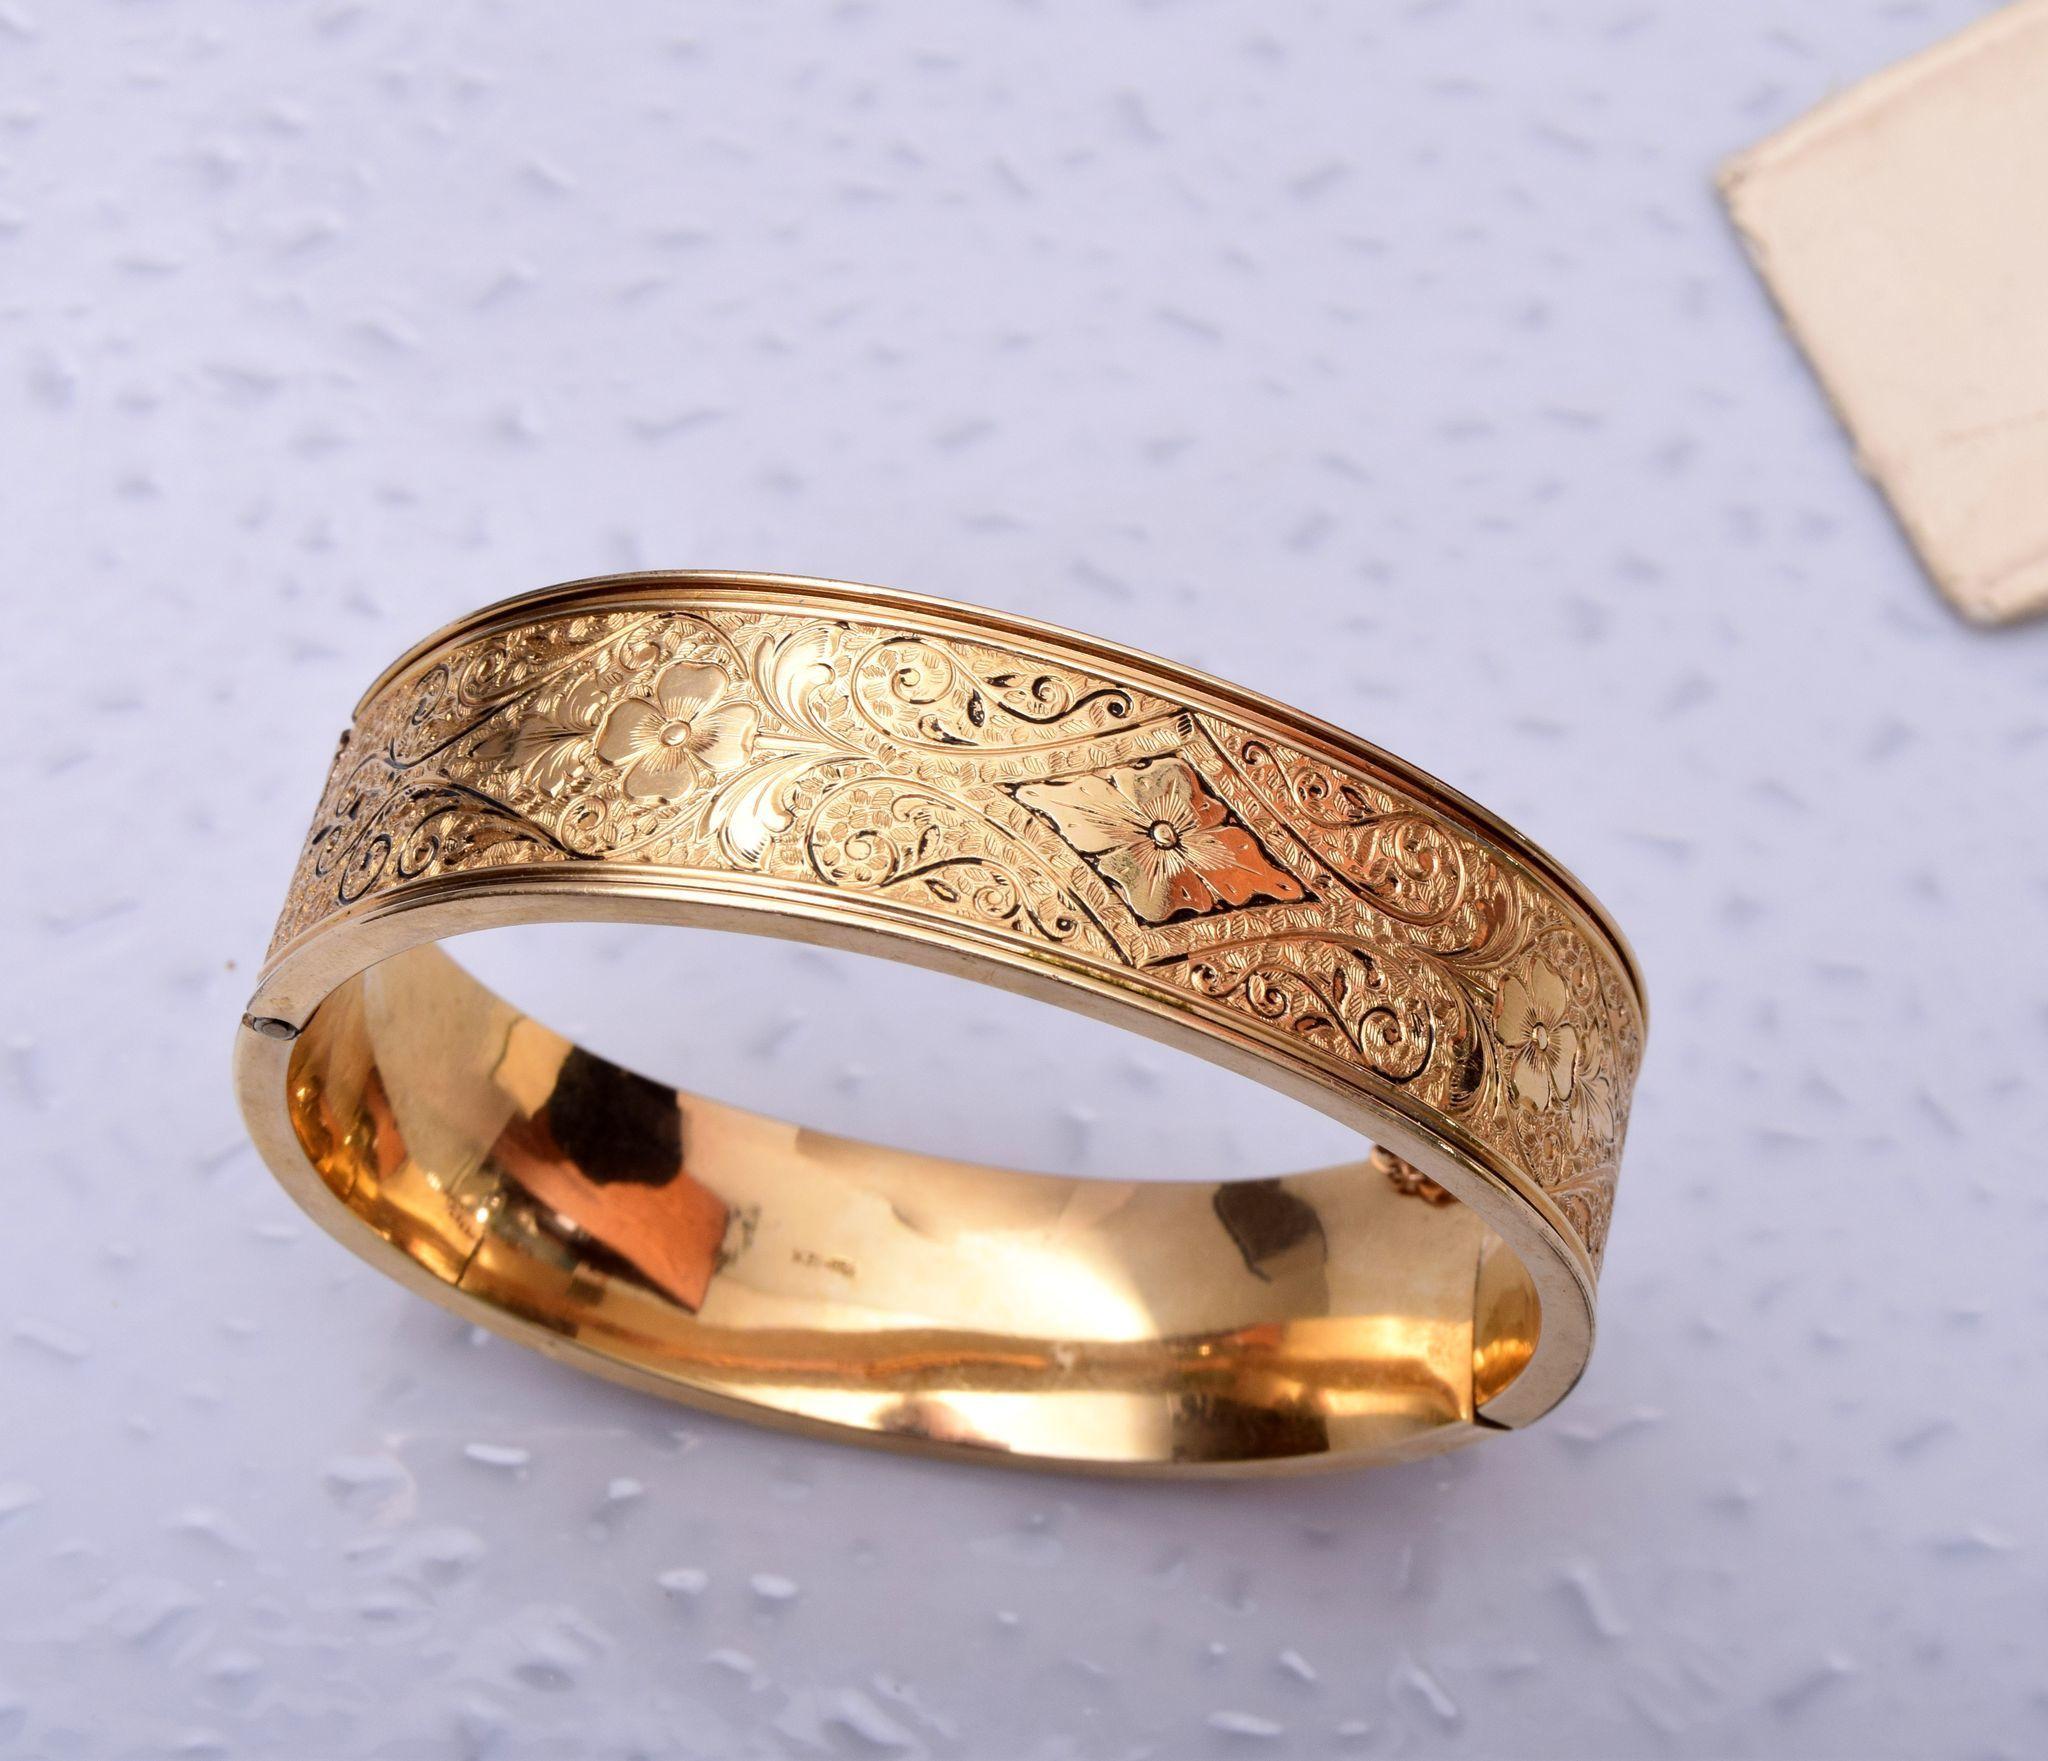 hinged wedding ring Winard 1 20 12kt Gold Filled Hinged Bangle Bracelet